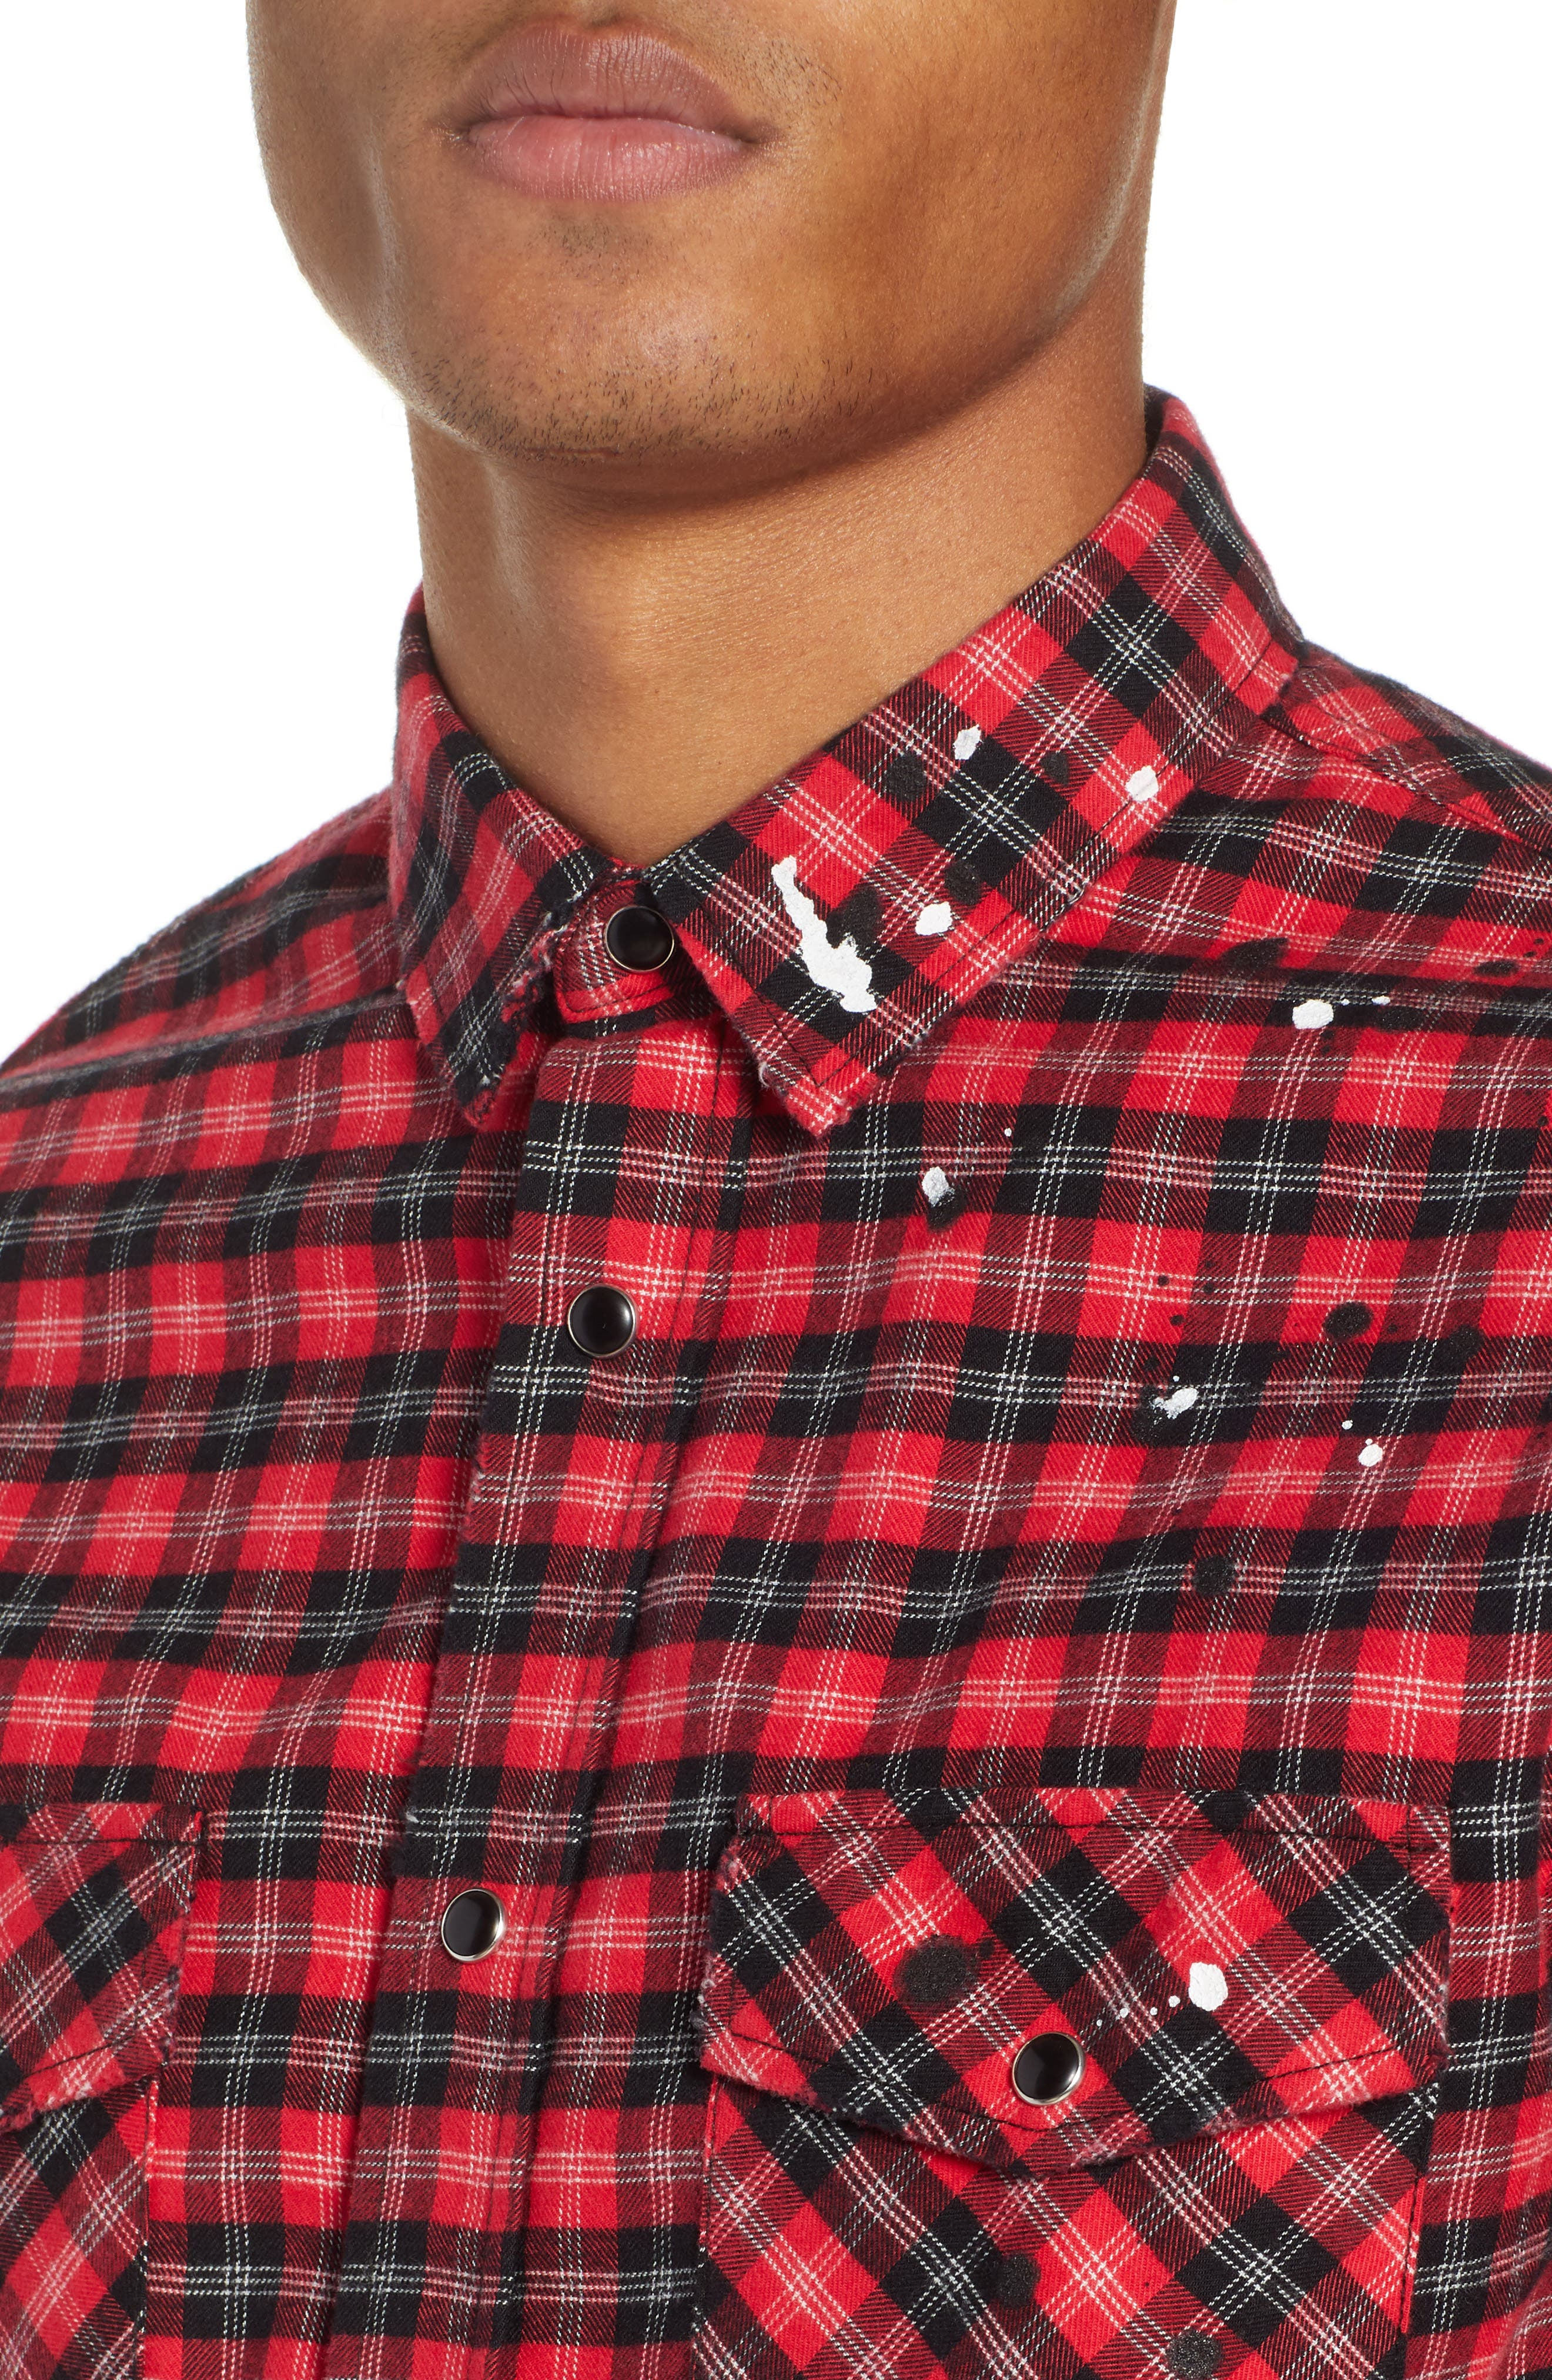 THE KOOPLES, Slim Fit Paint Spatter Flannel Shirt, Alternate thumbnail 2, color, 600